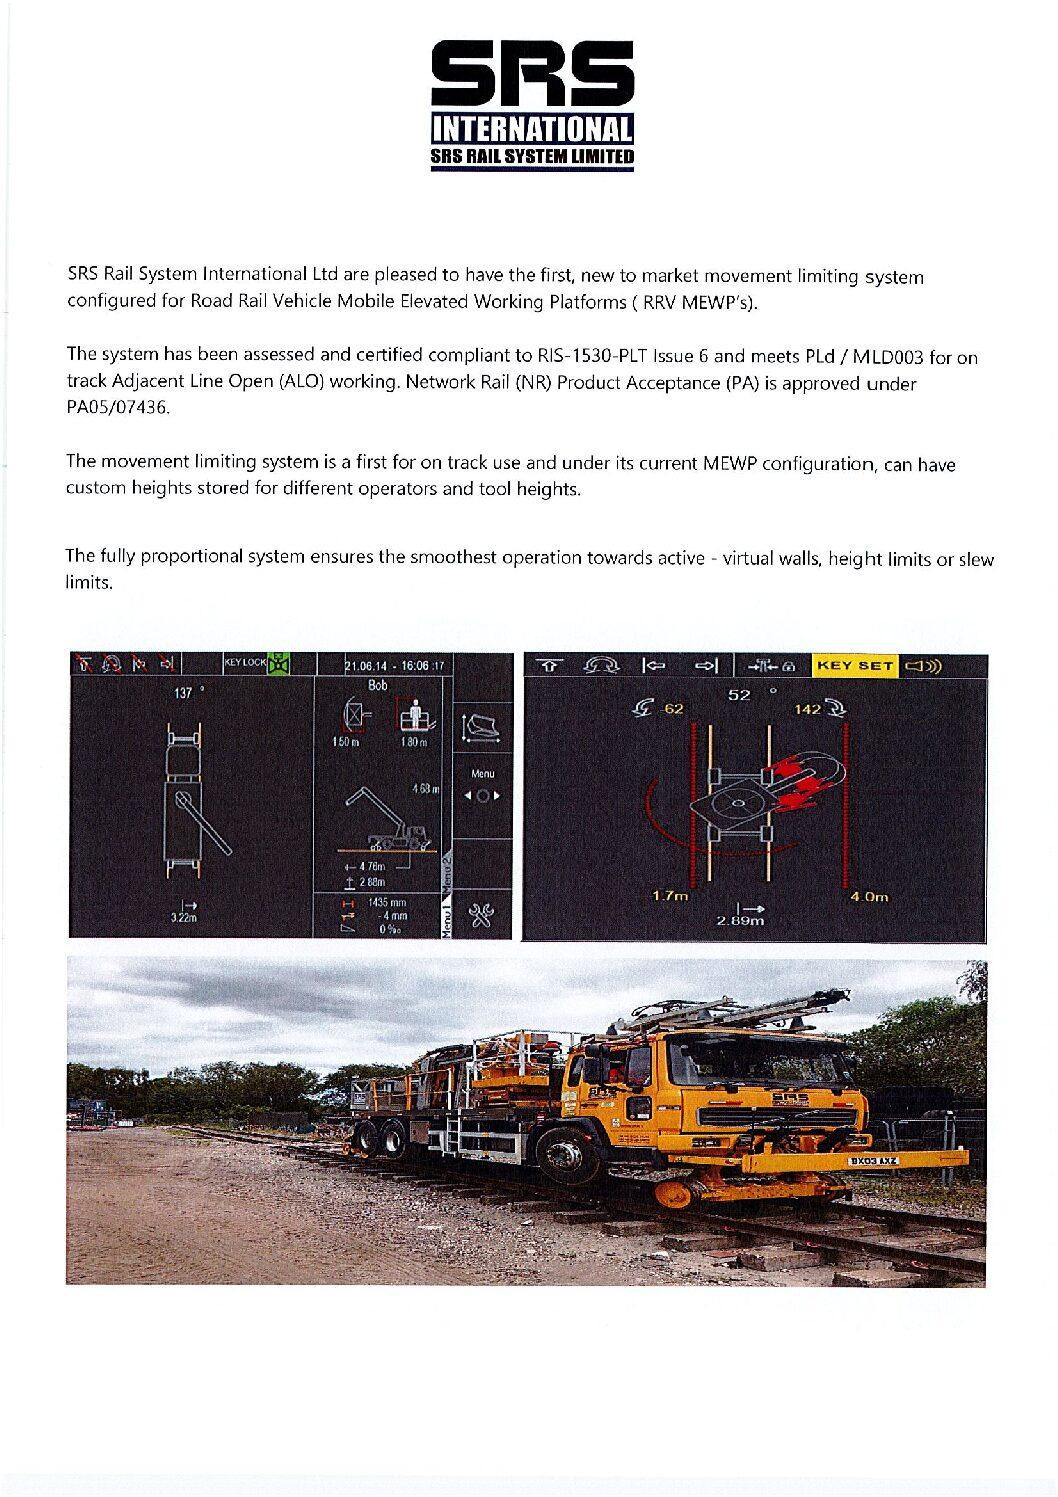 SRS Rail Movement Limiting System